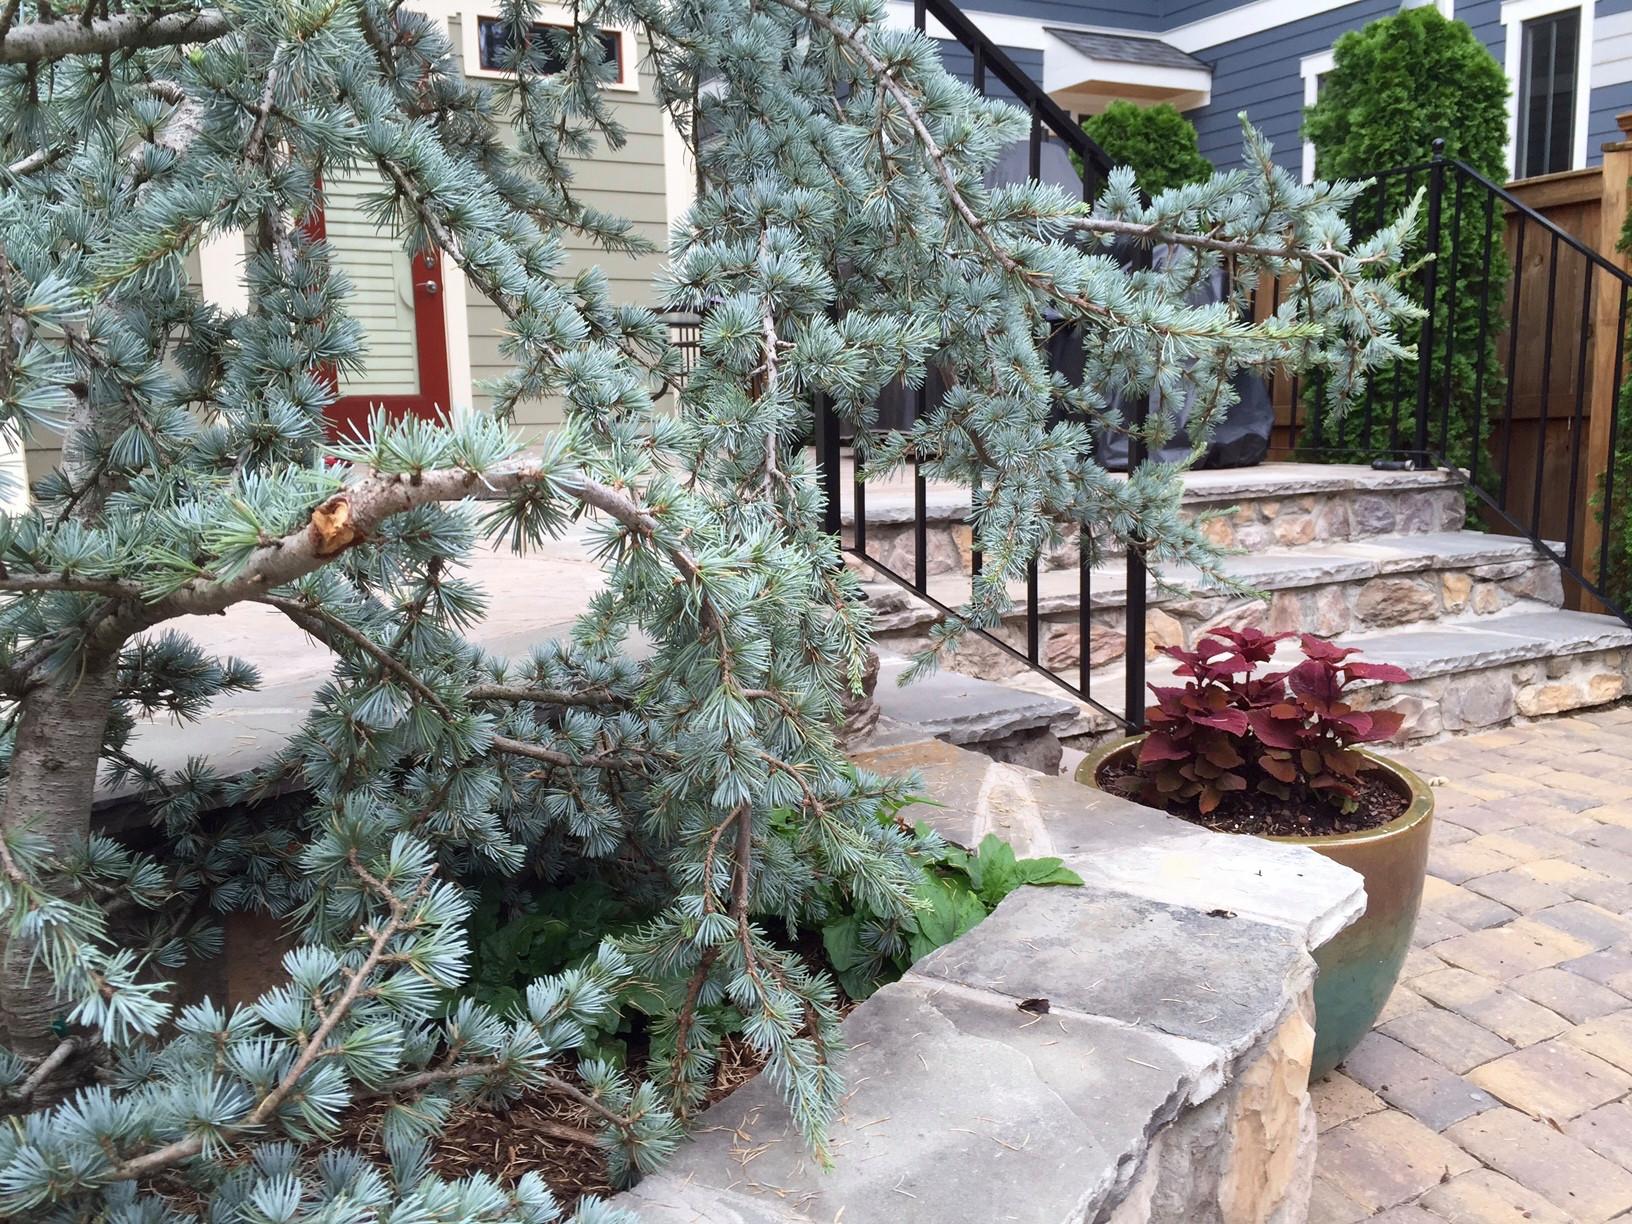 Blue Atlas Cedar and coleus